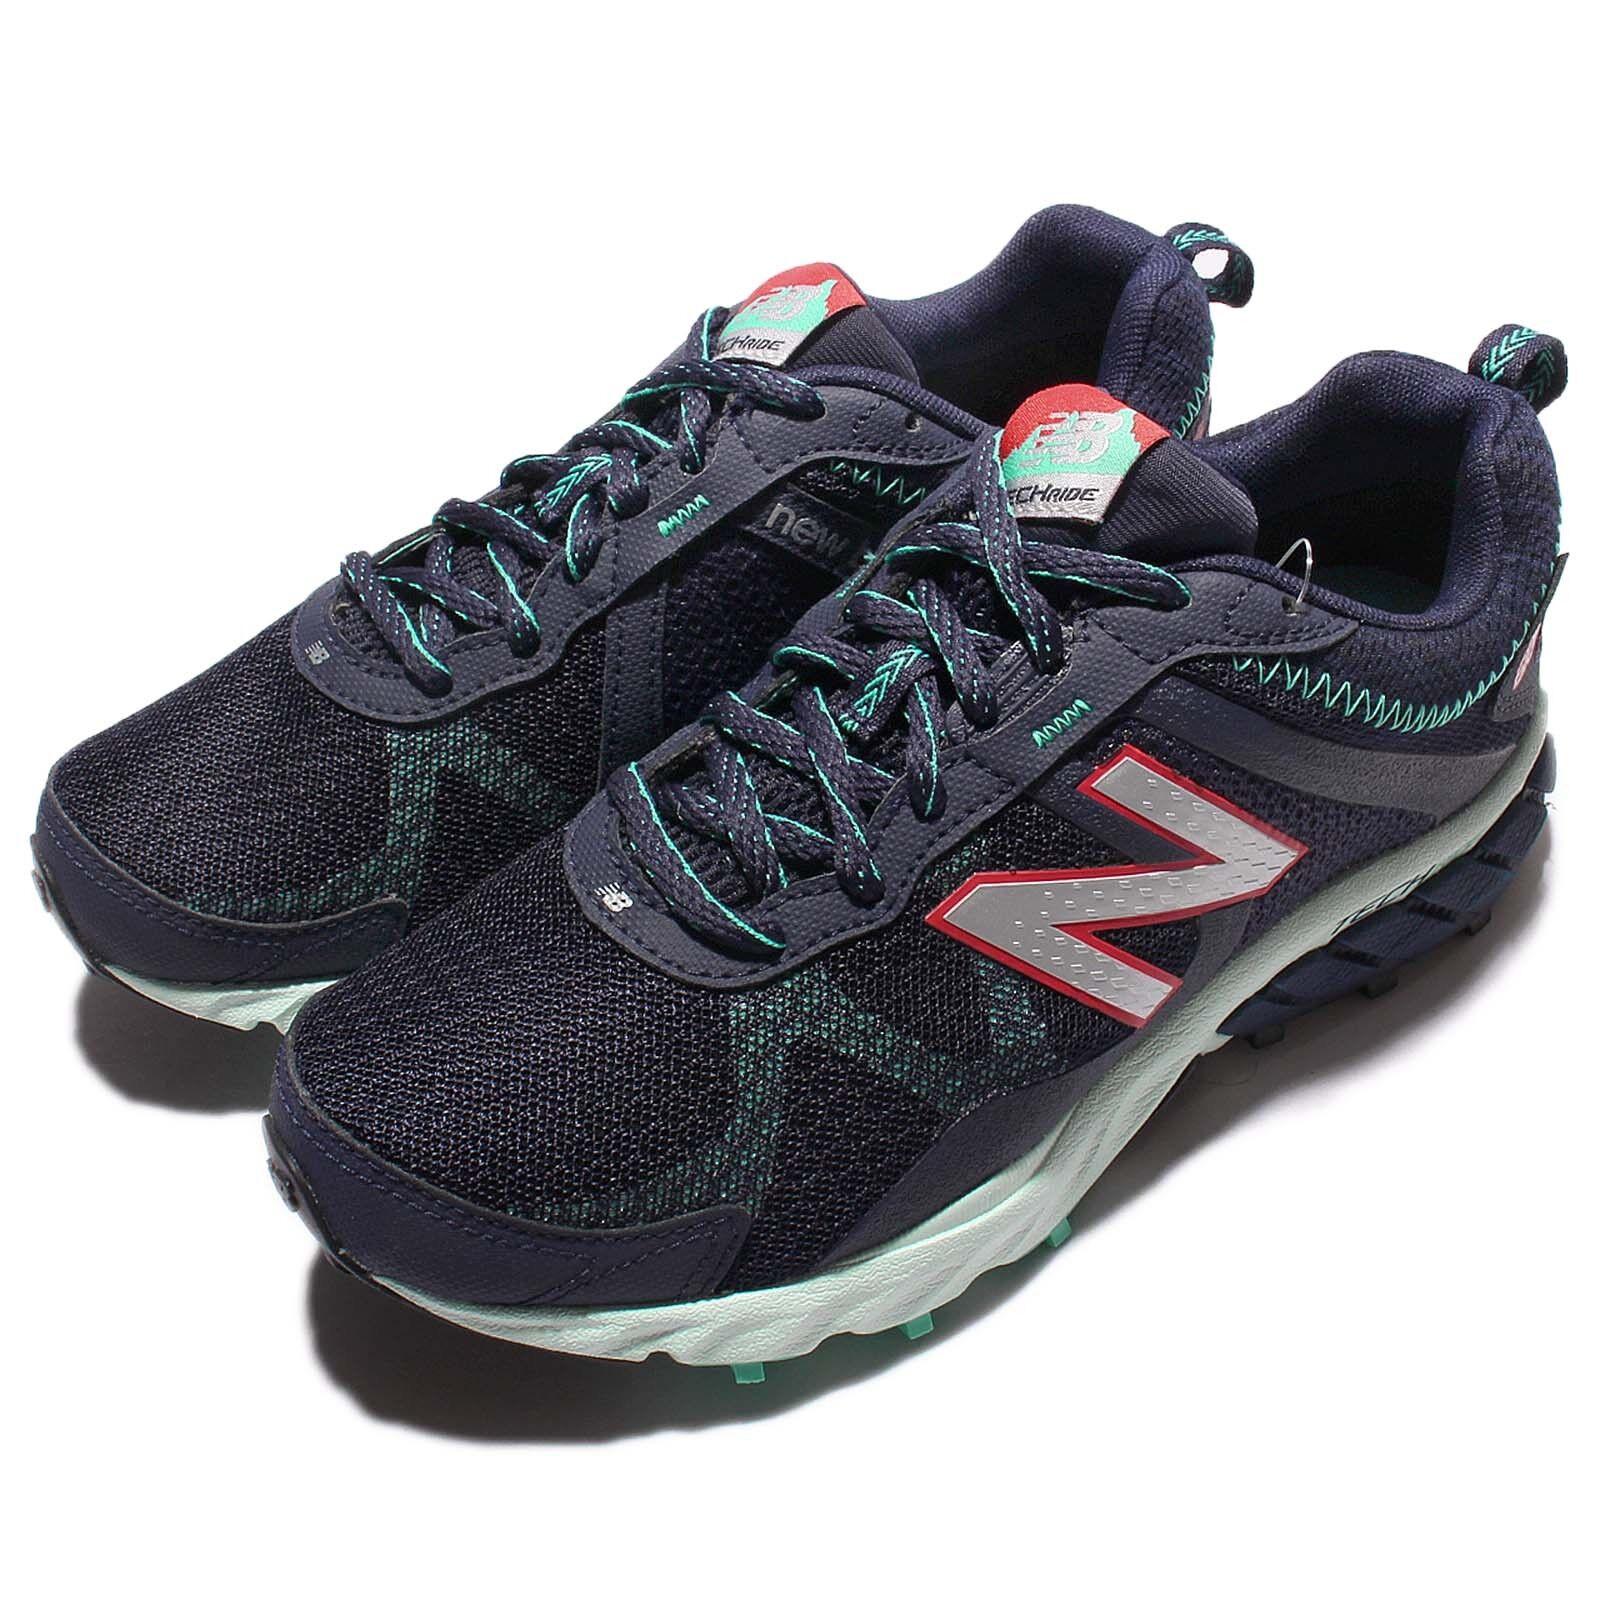 New Balance WT610GX5 B Navy verde donna Trail Running Outdoor scarpe da ginnastica WT610GX5B